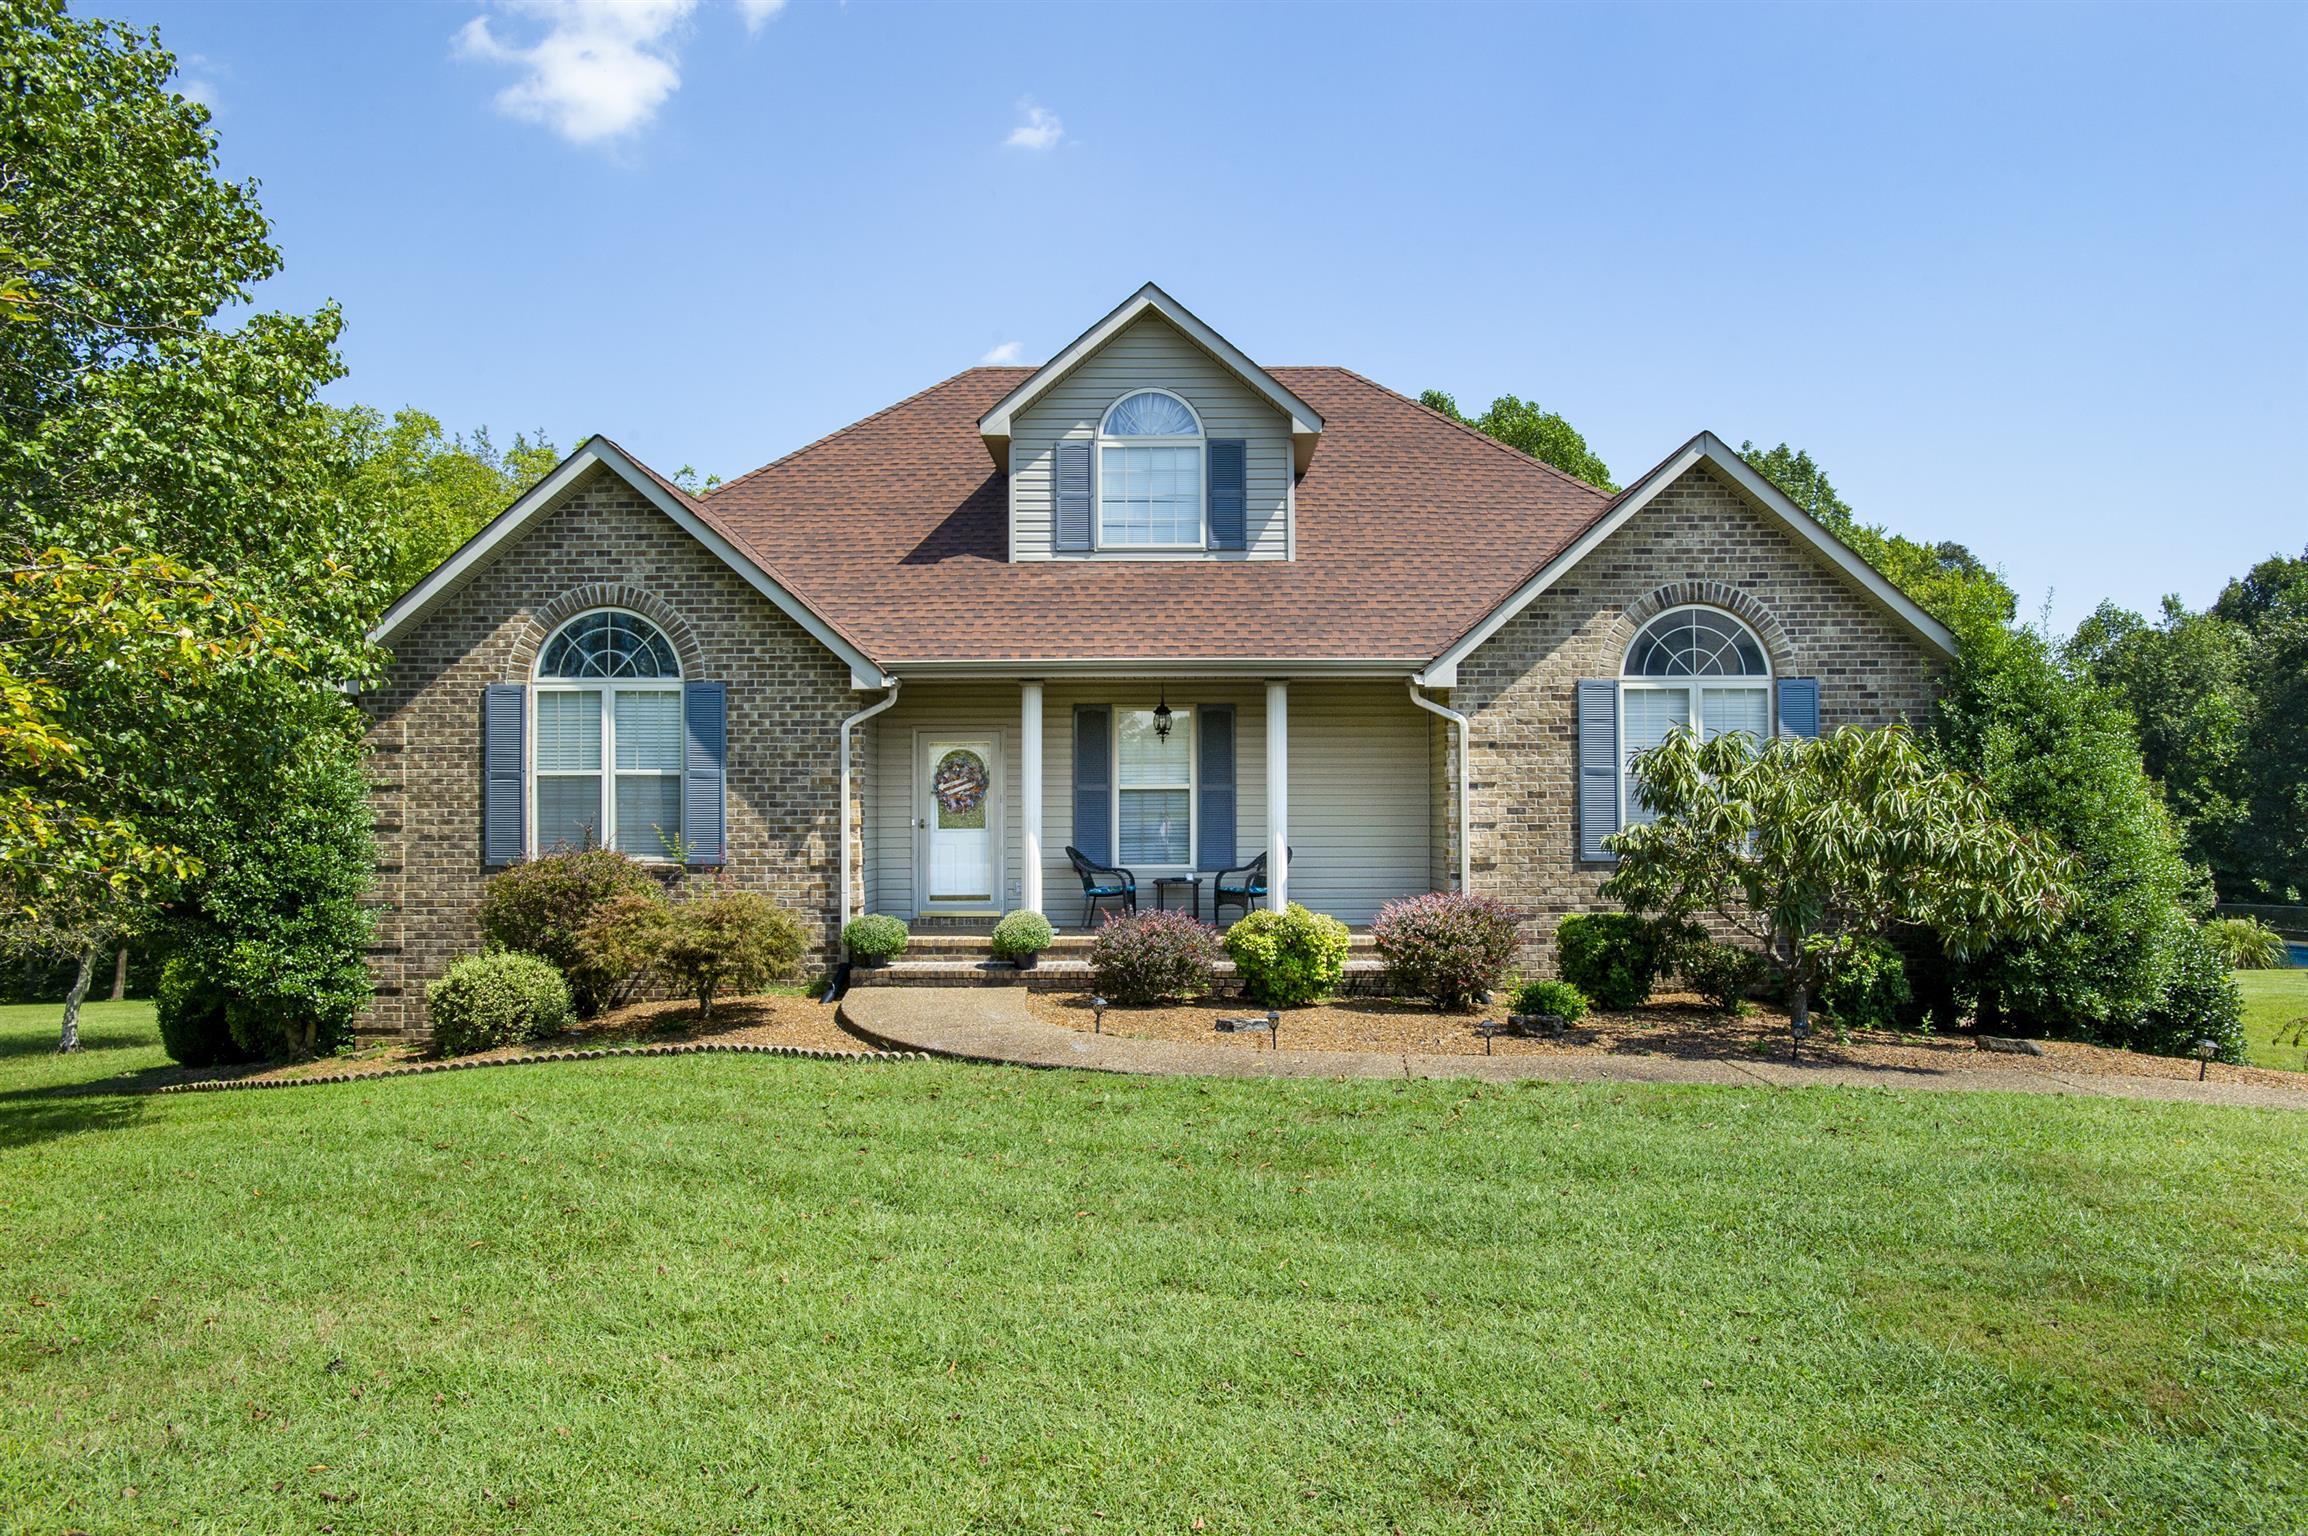 212 Deer Park Ln, Lafayette, TN 37083 - Lafayette, TN real estate listing